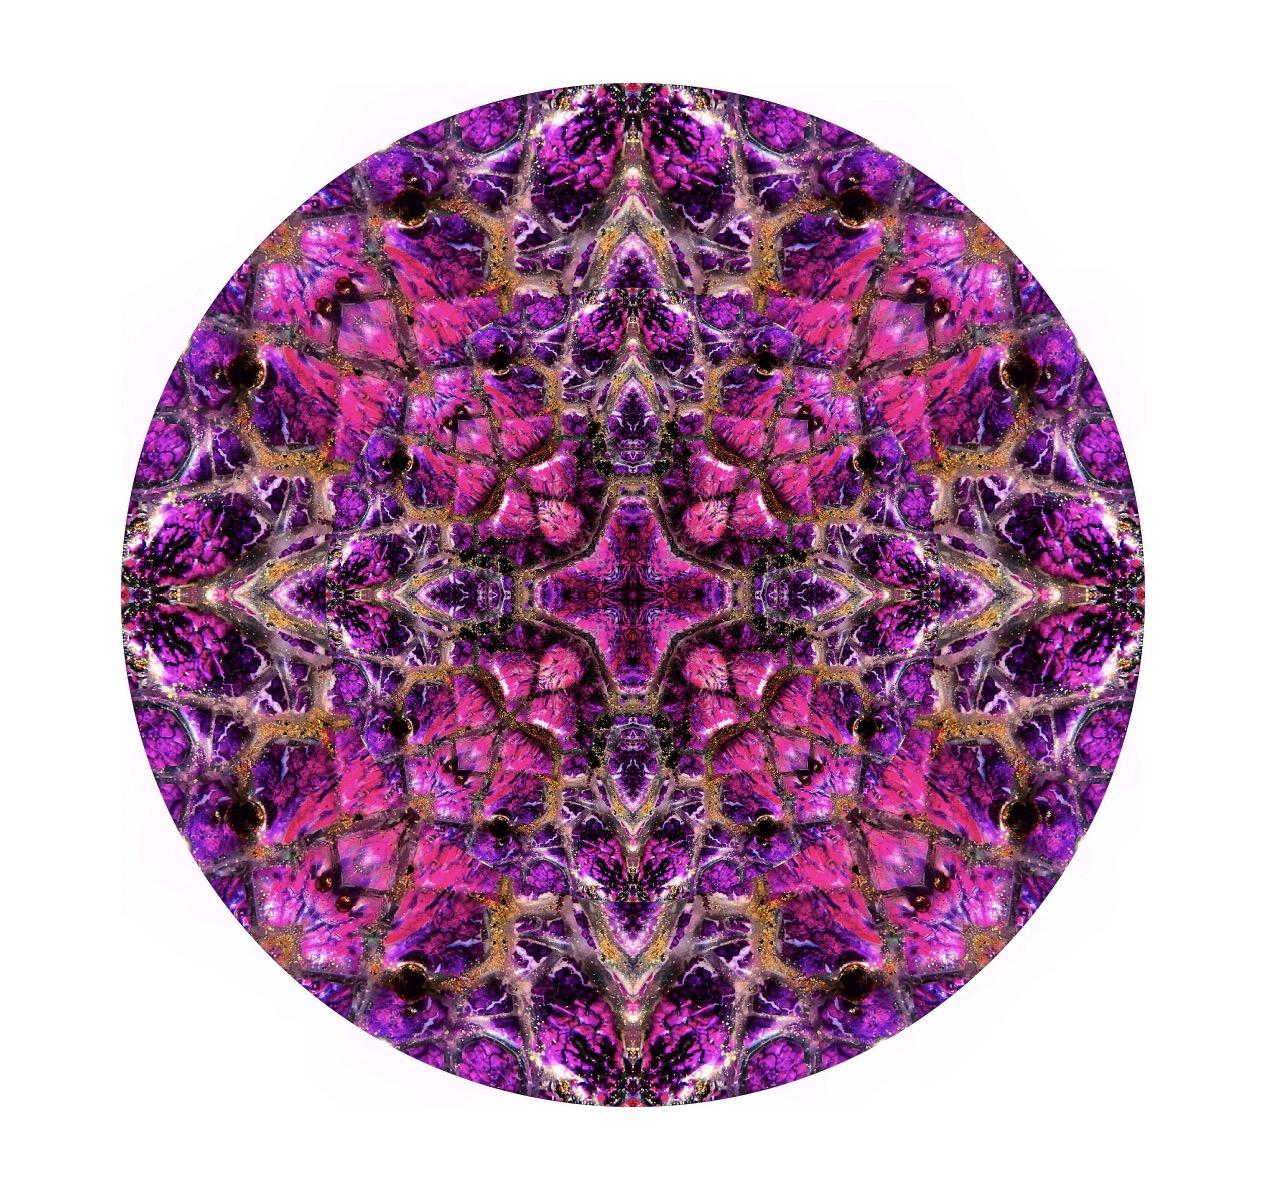 Modern Mandalas - Examining pareidolia in my art